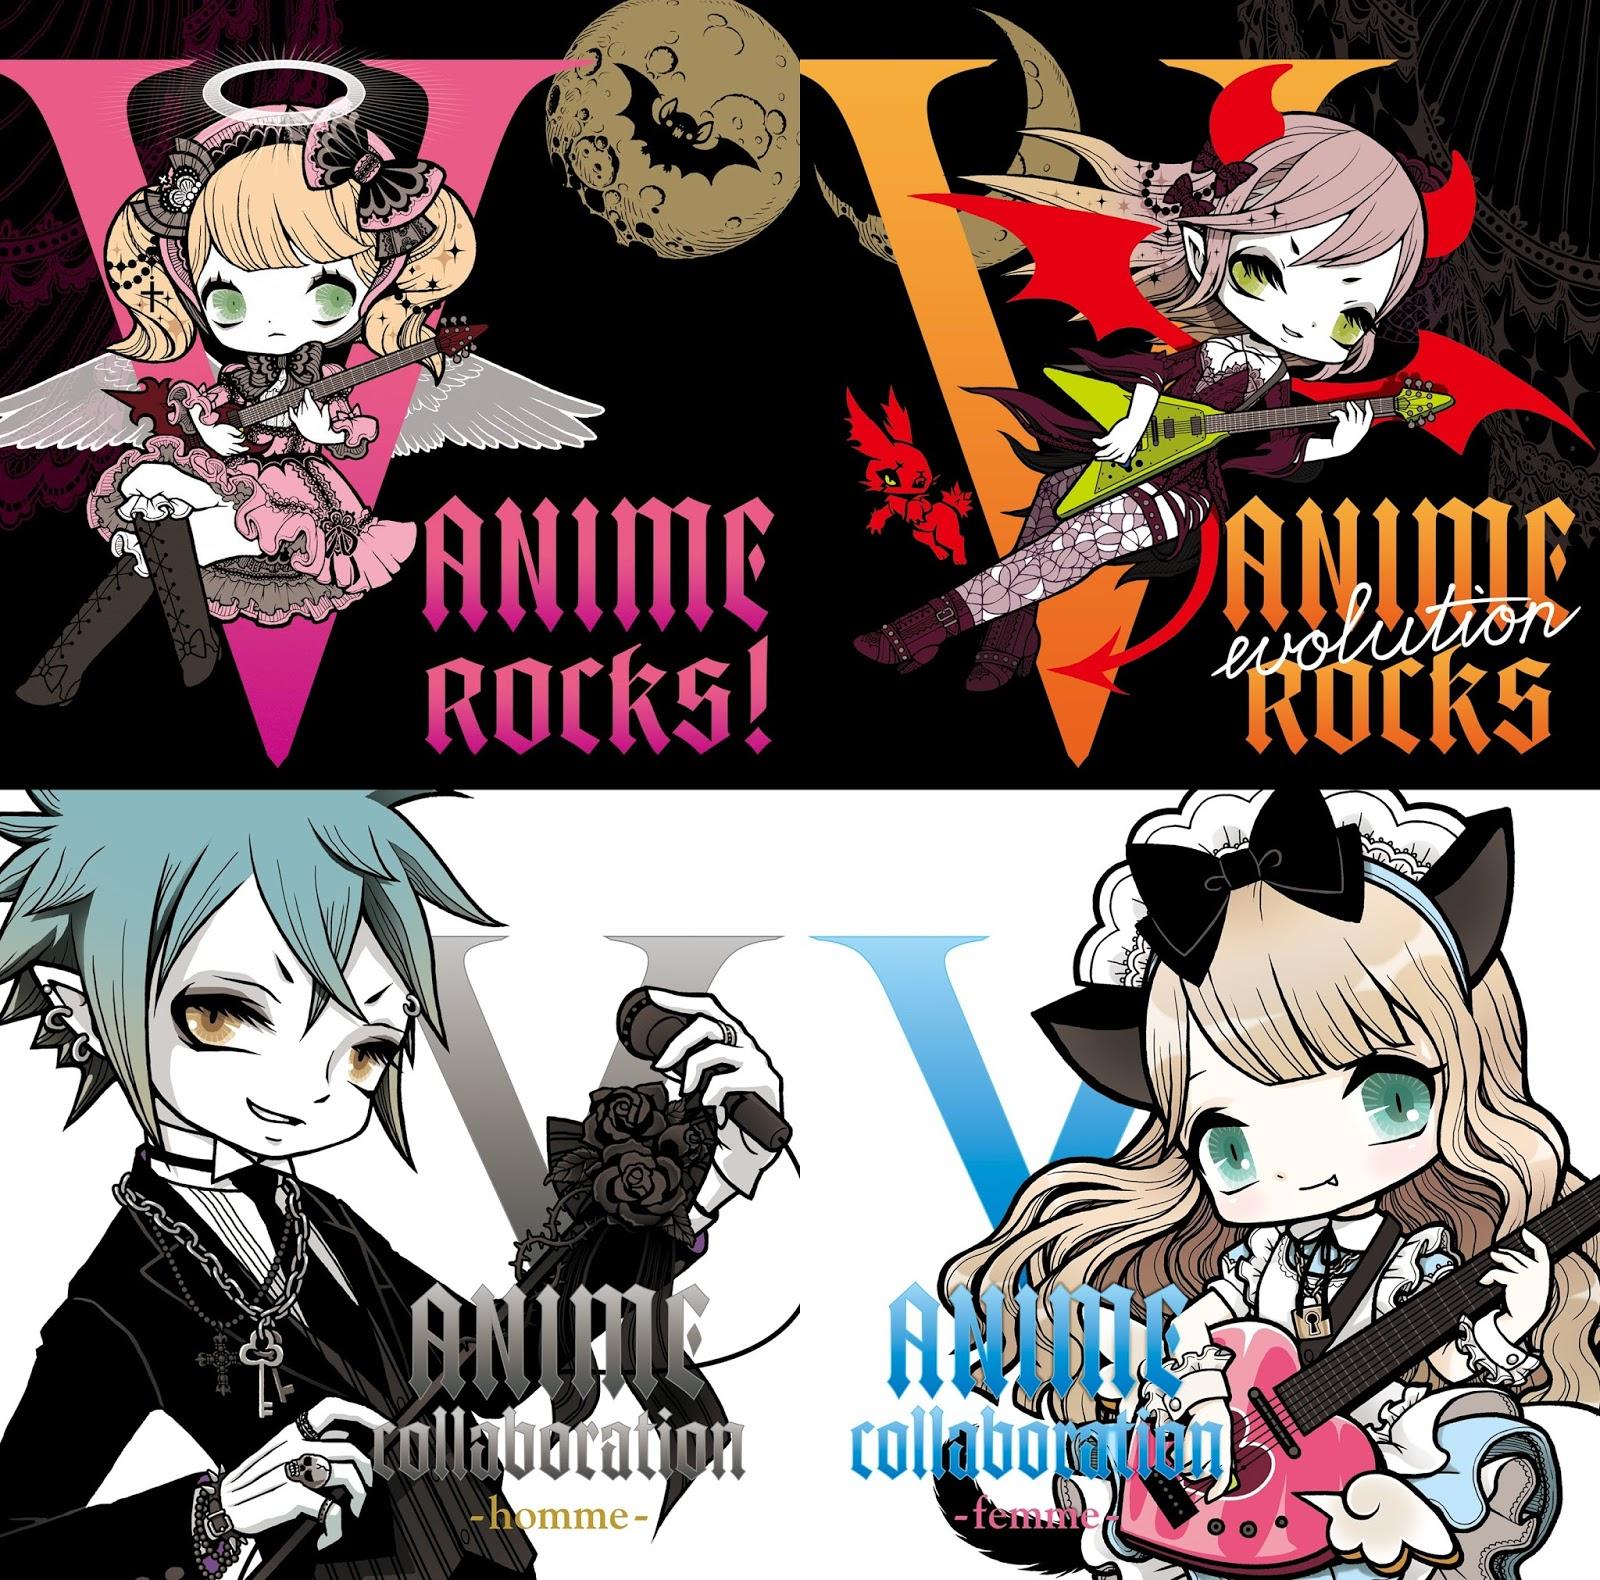 V Anime Rocks